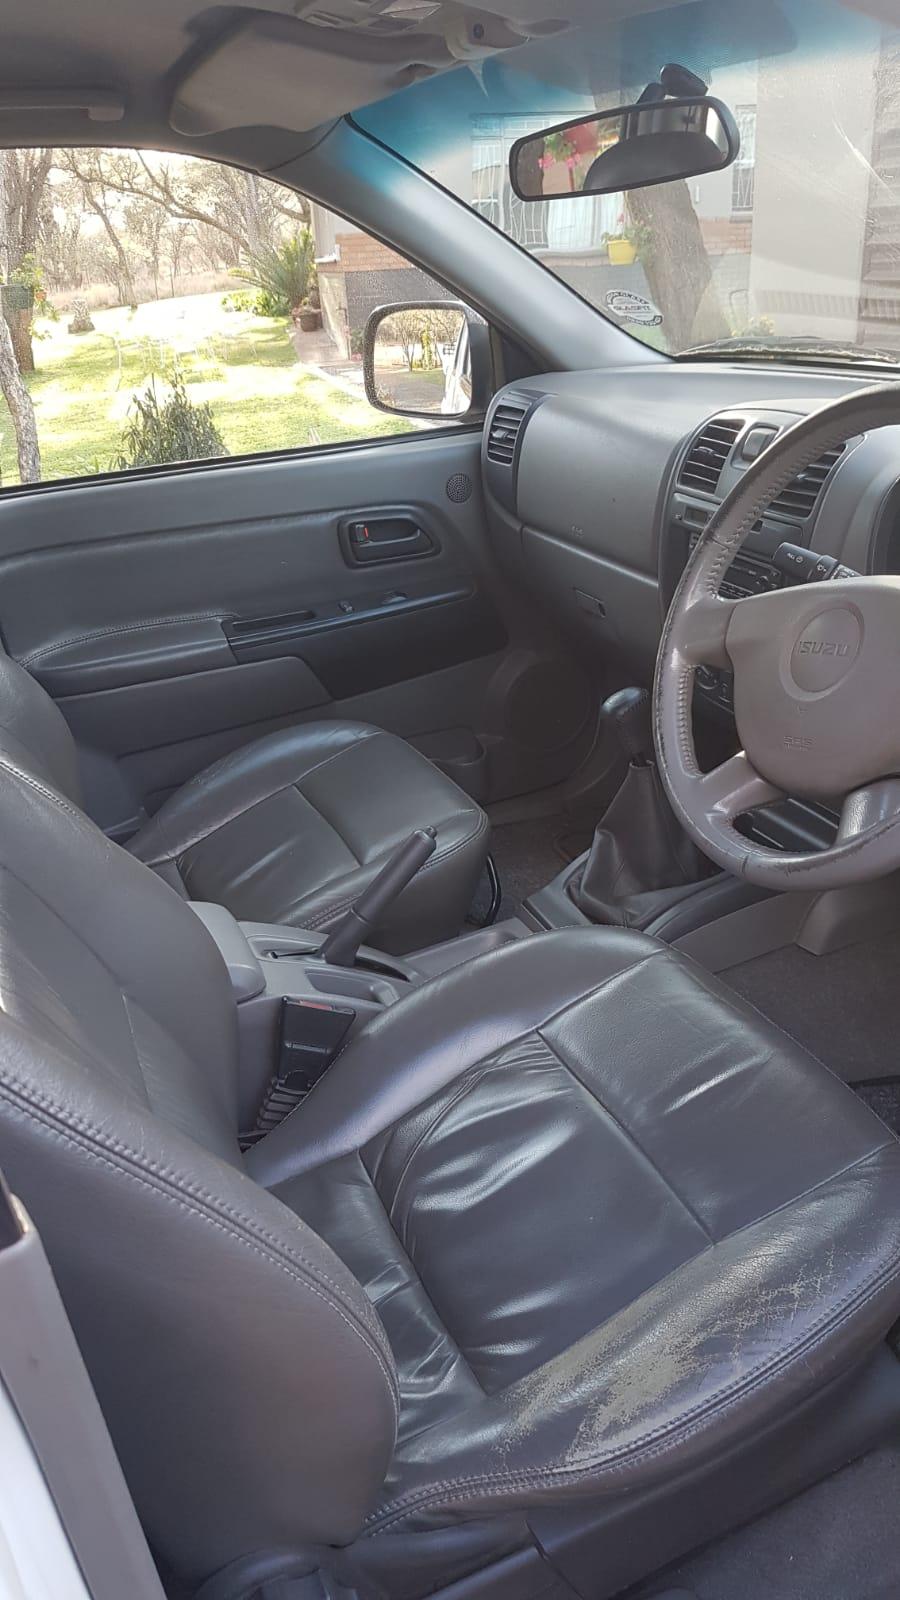 2005 Isuzu KB 300TDI double cab LX